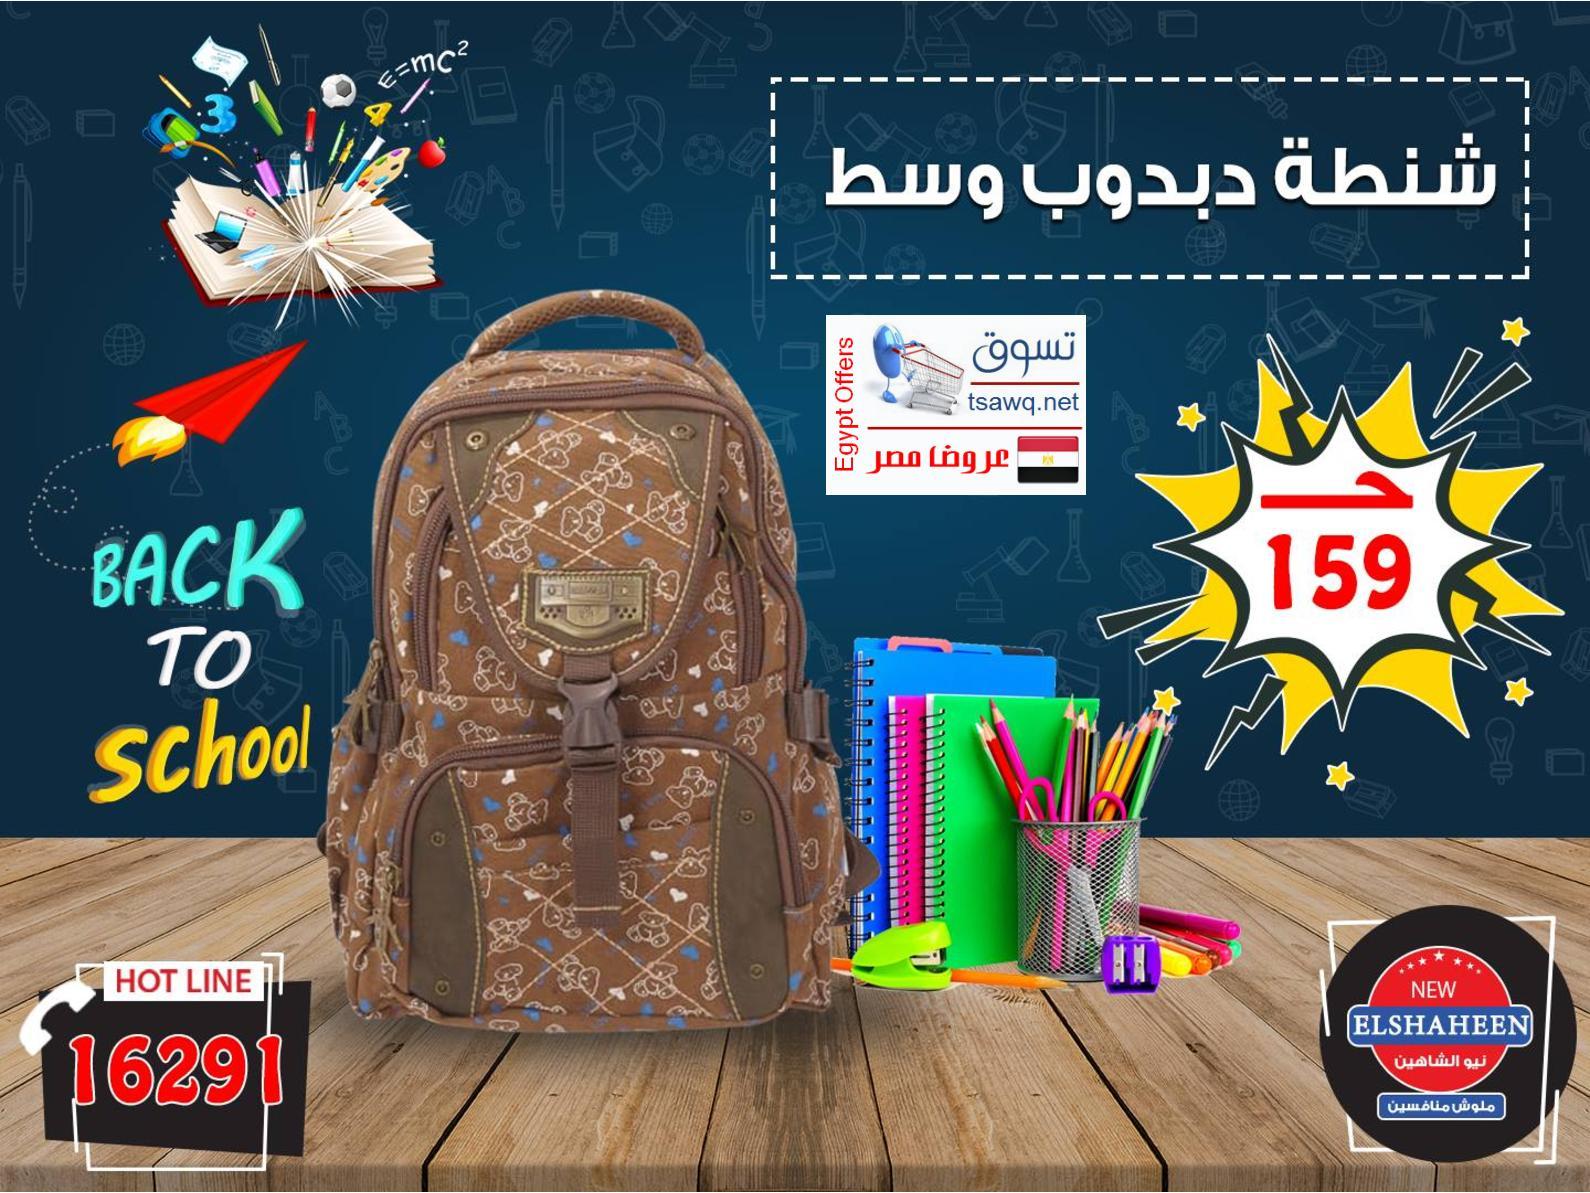 de4f26edd6738 عروض سنتر شاهين من 25 أغسطس حتى 25 سبتمبر 2018 المدرسة